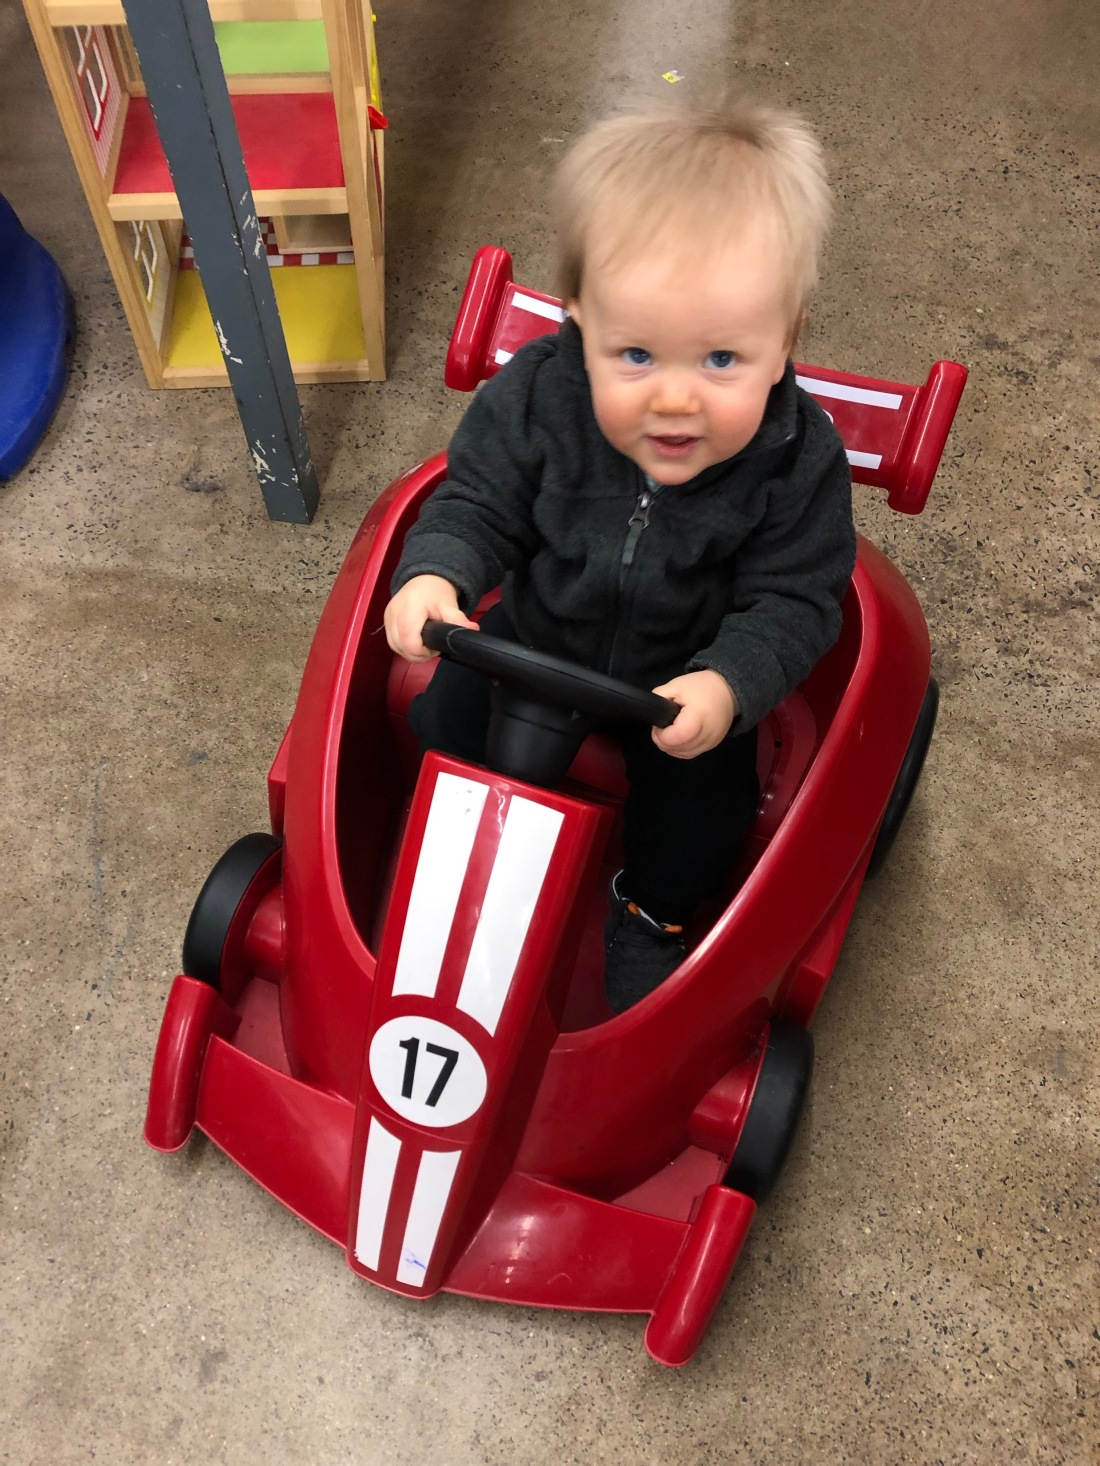 baby in a racecar